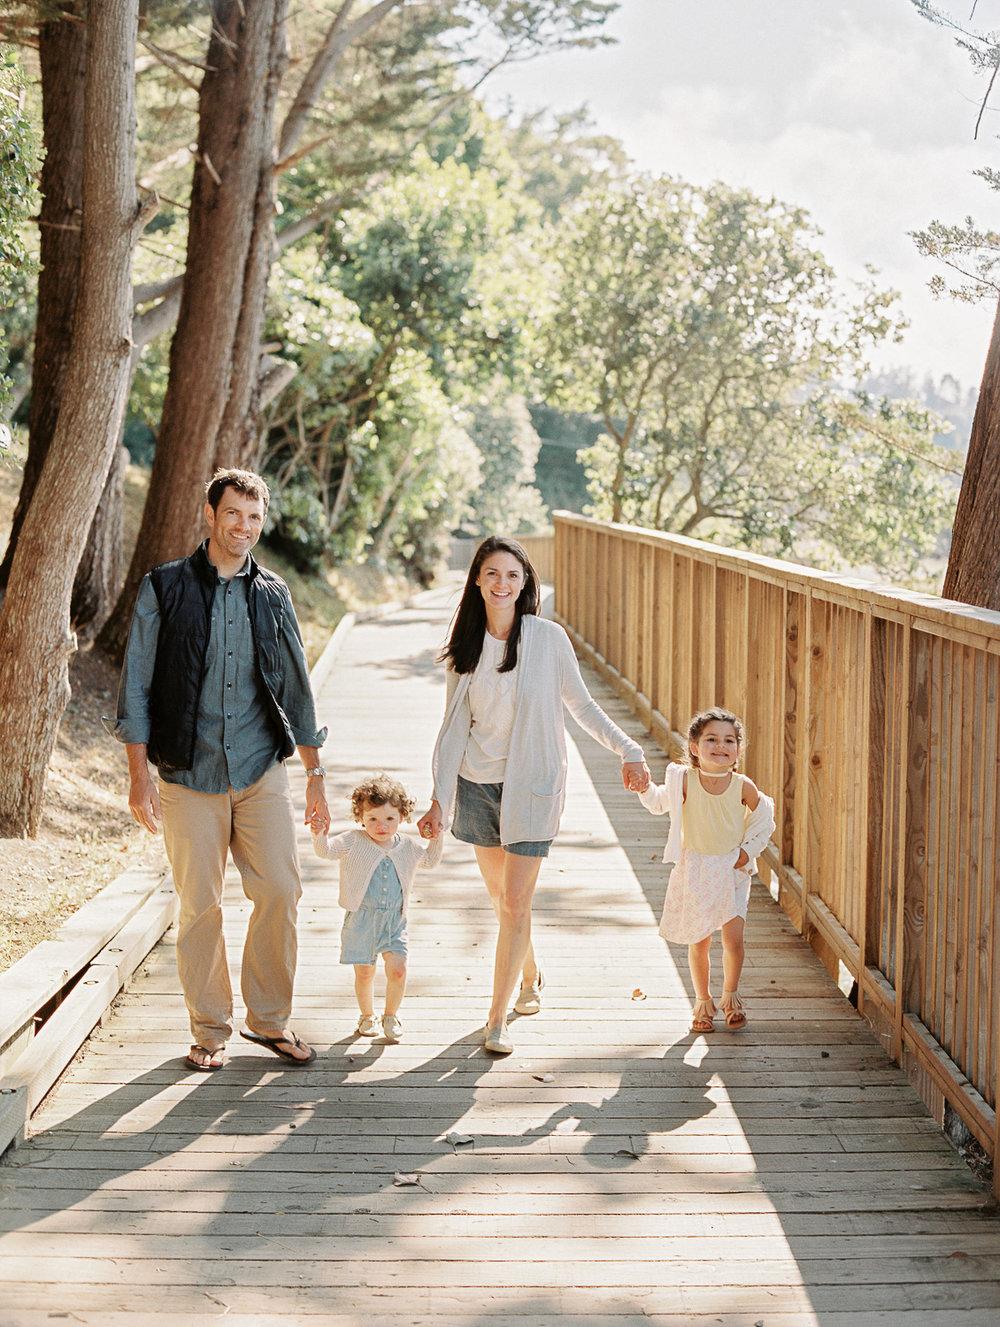 familiesweb0001.jpg